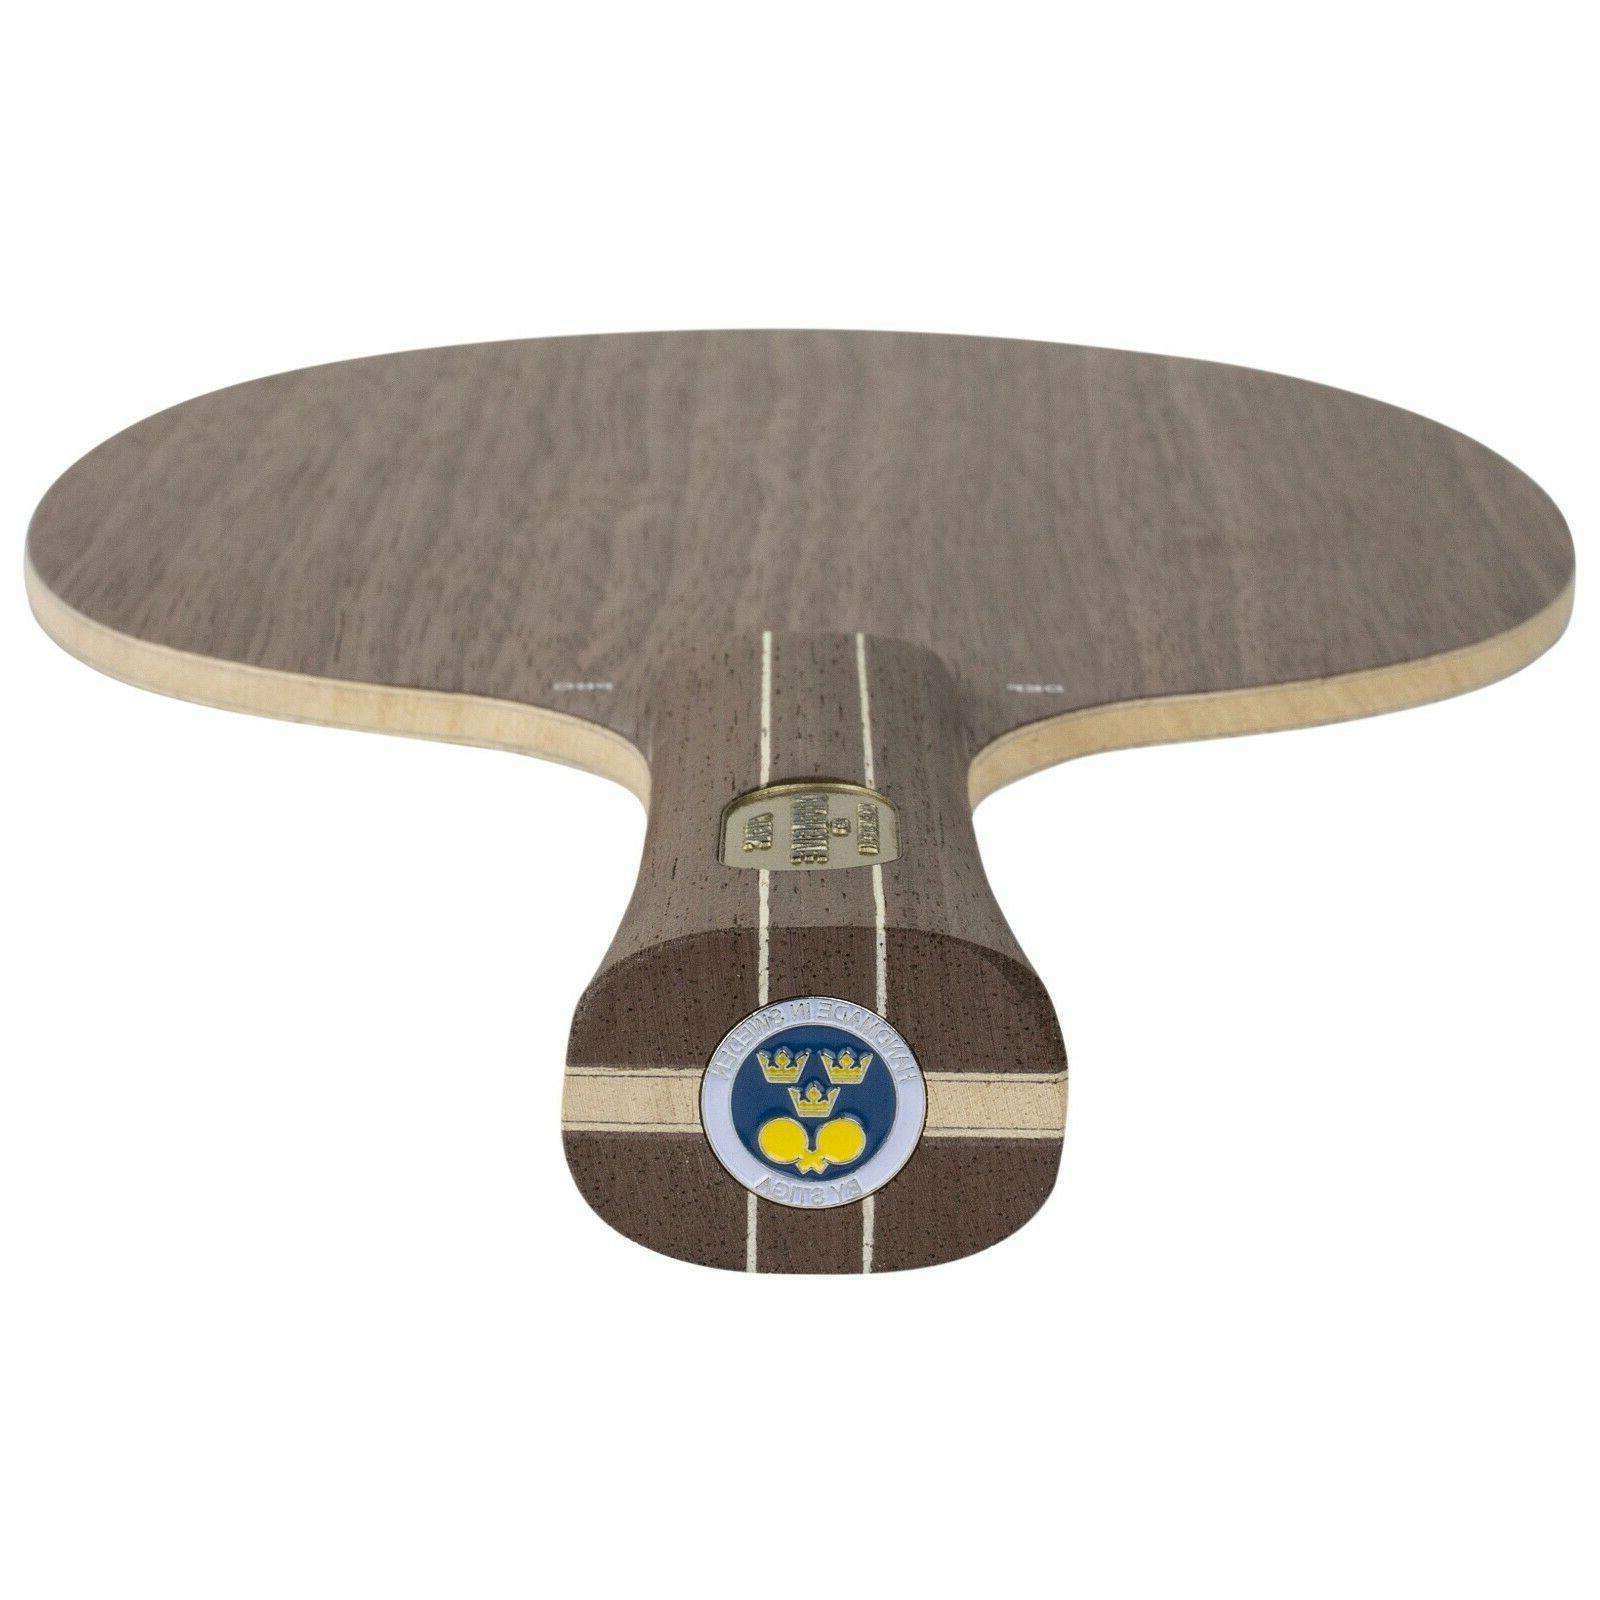 Stiga Defensive Table Tennis Ping